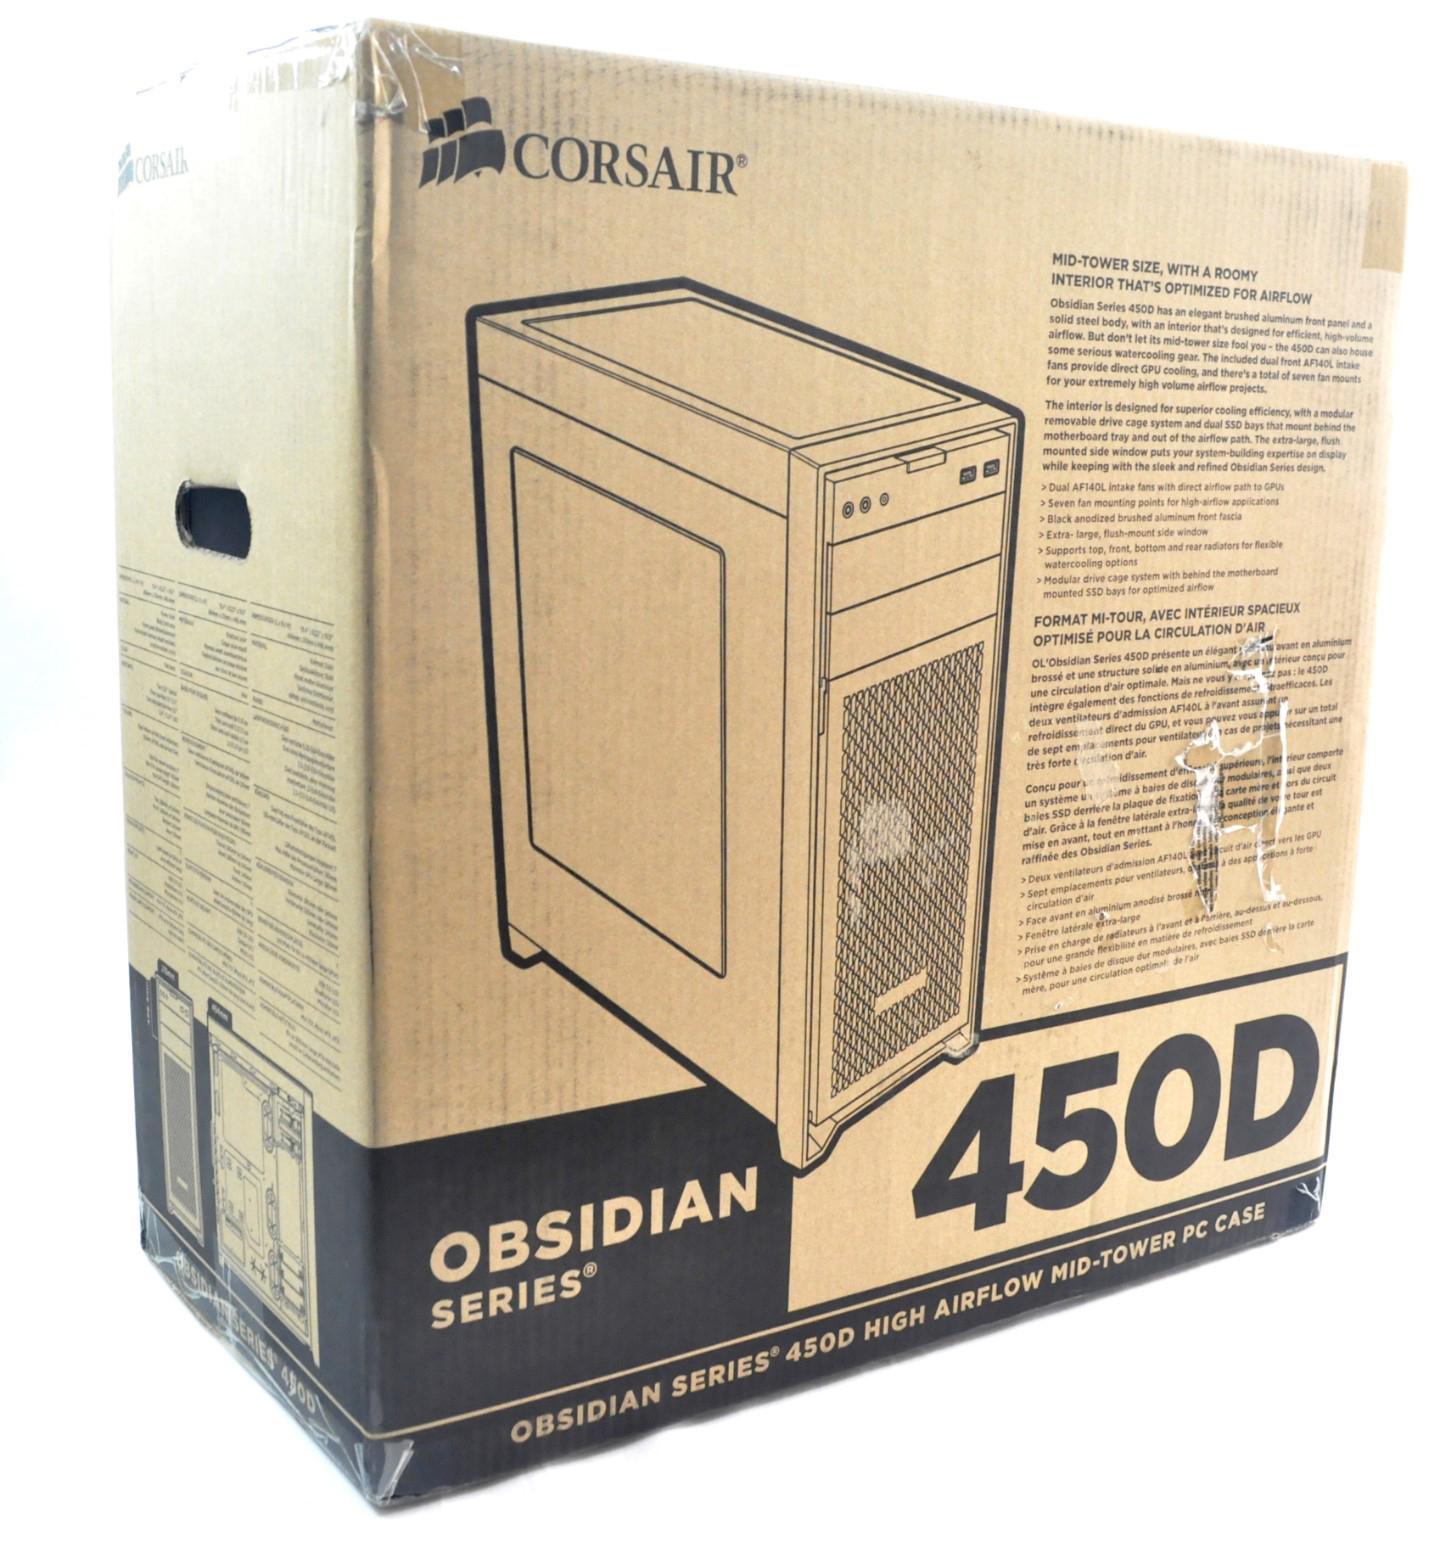 Corsair Obsidian 450D